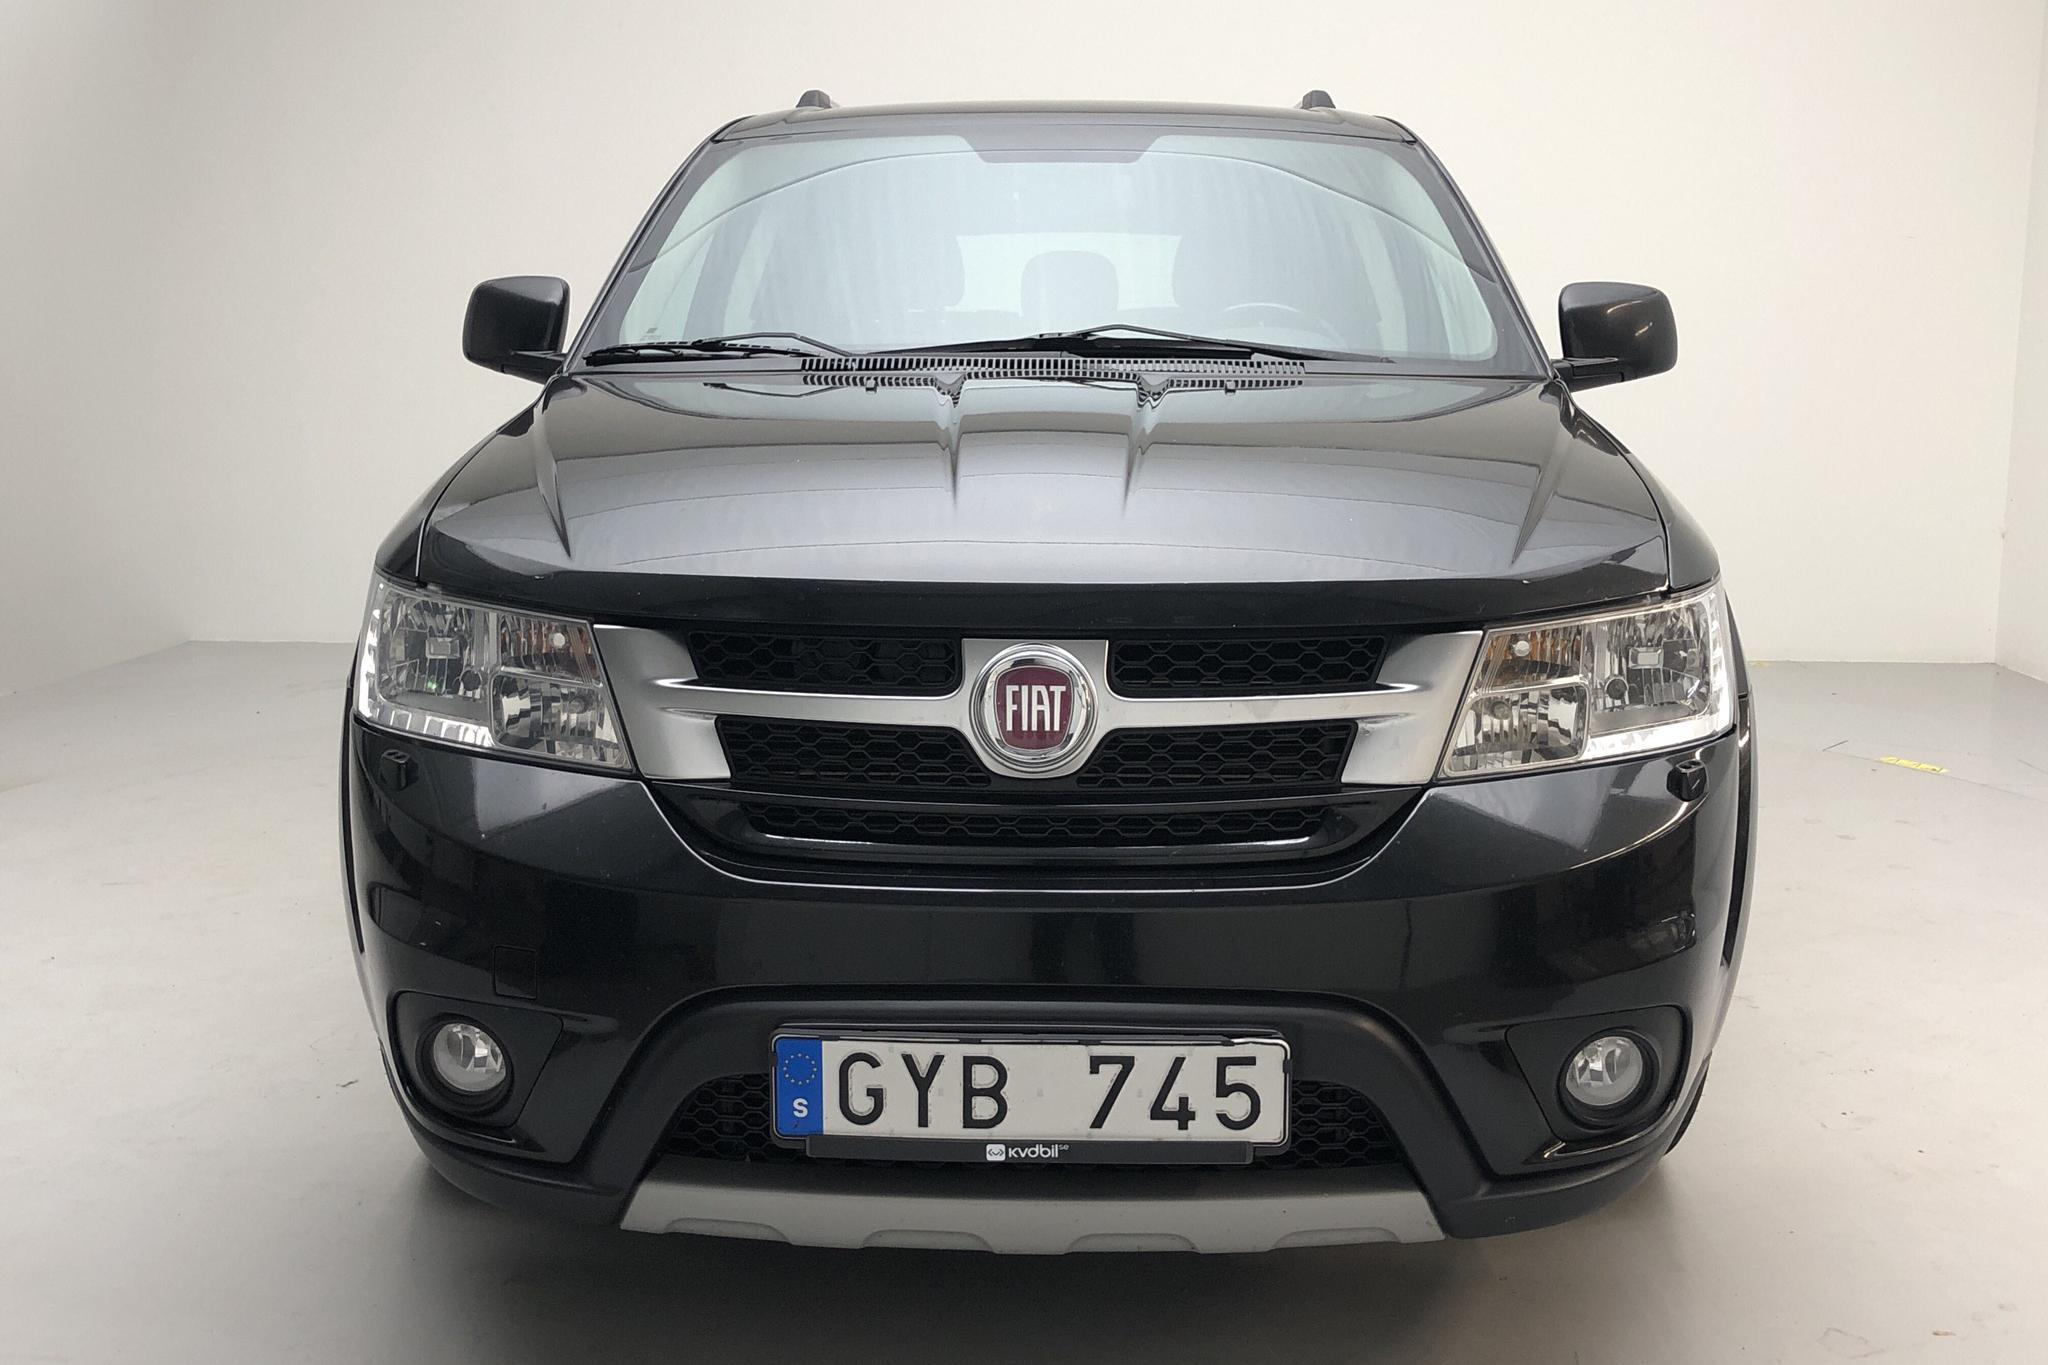 Fiat Freemont 2.0 Multijet AWD (170hk) - 22 619 mil - Automat - svart - 2012